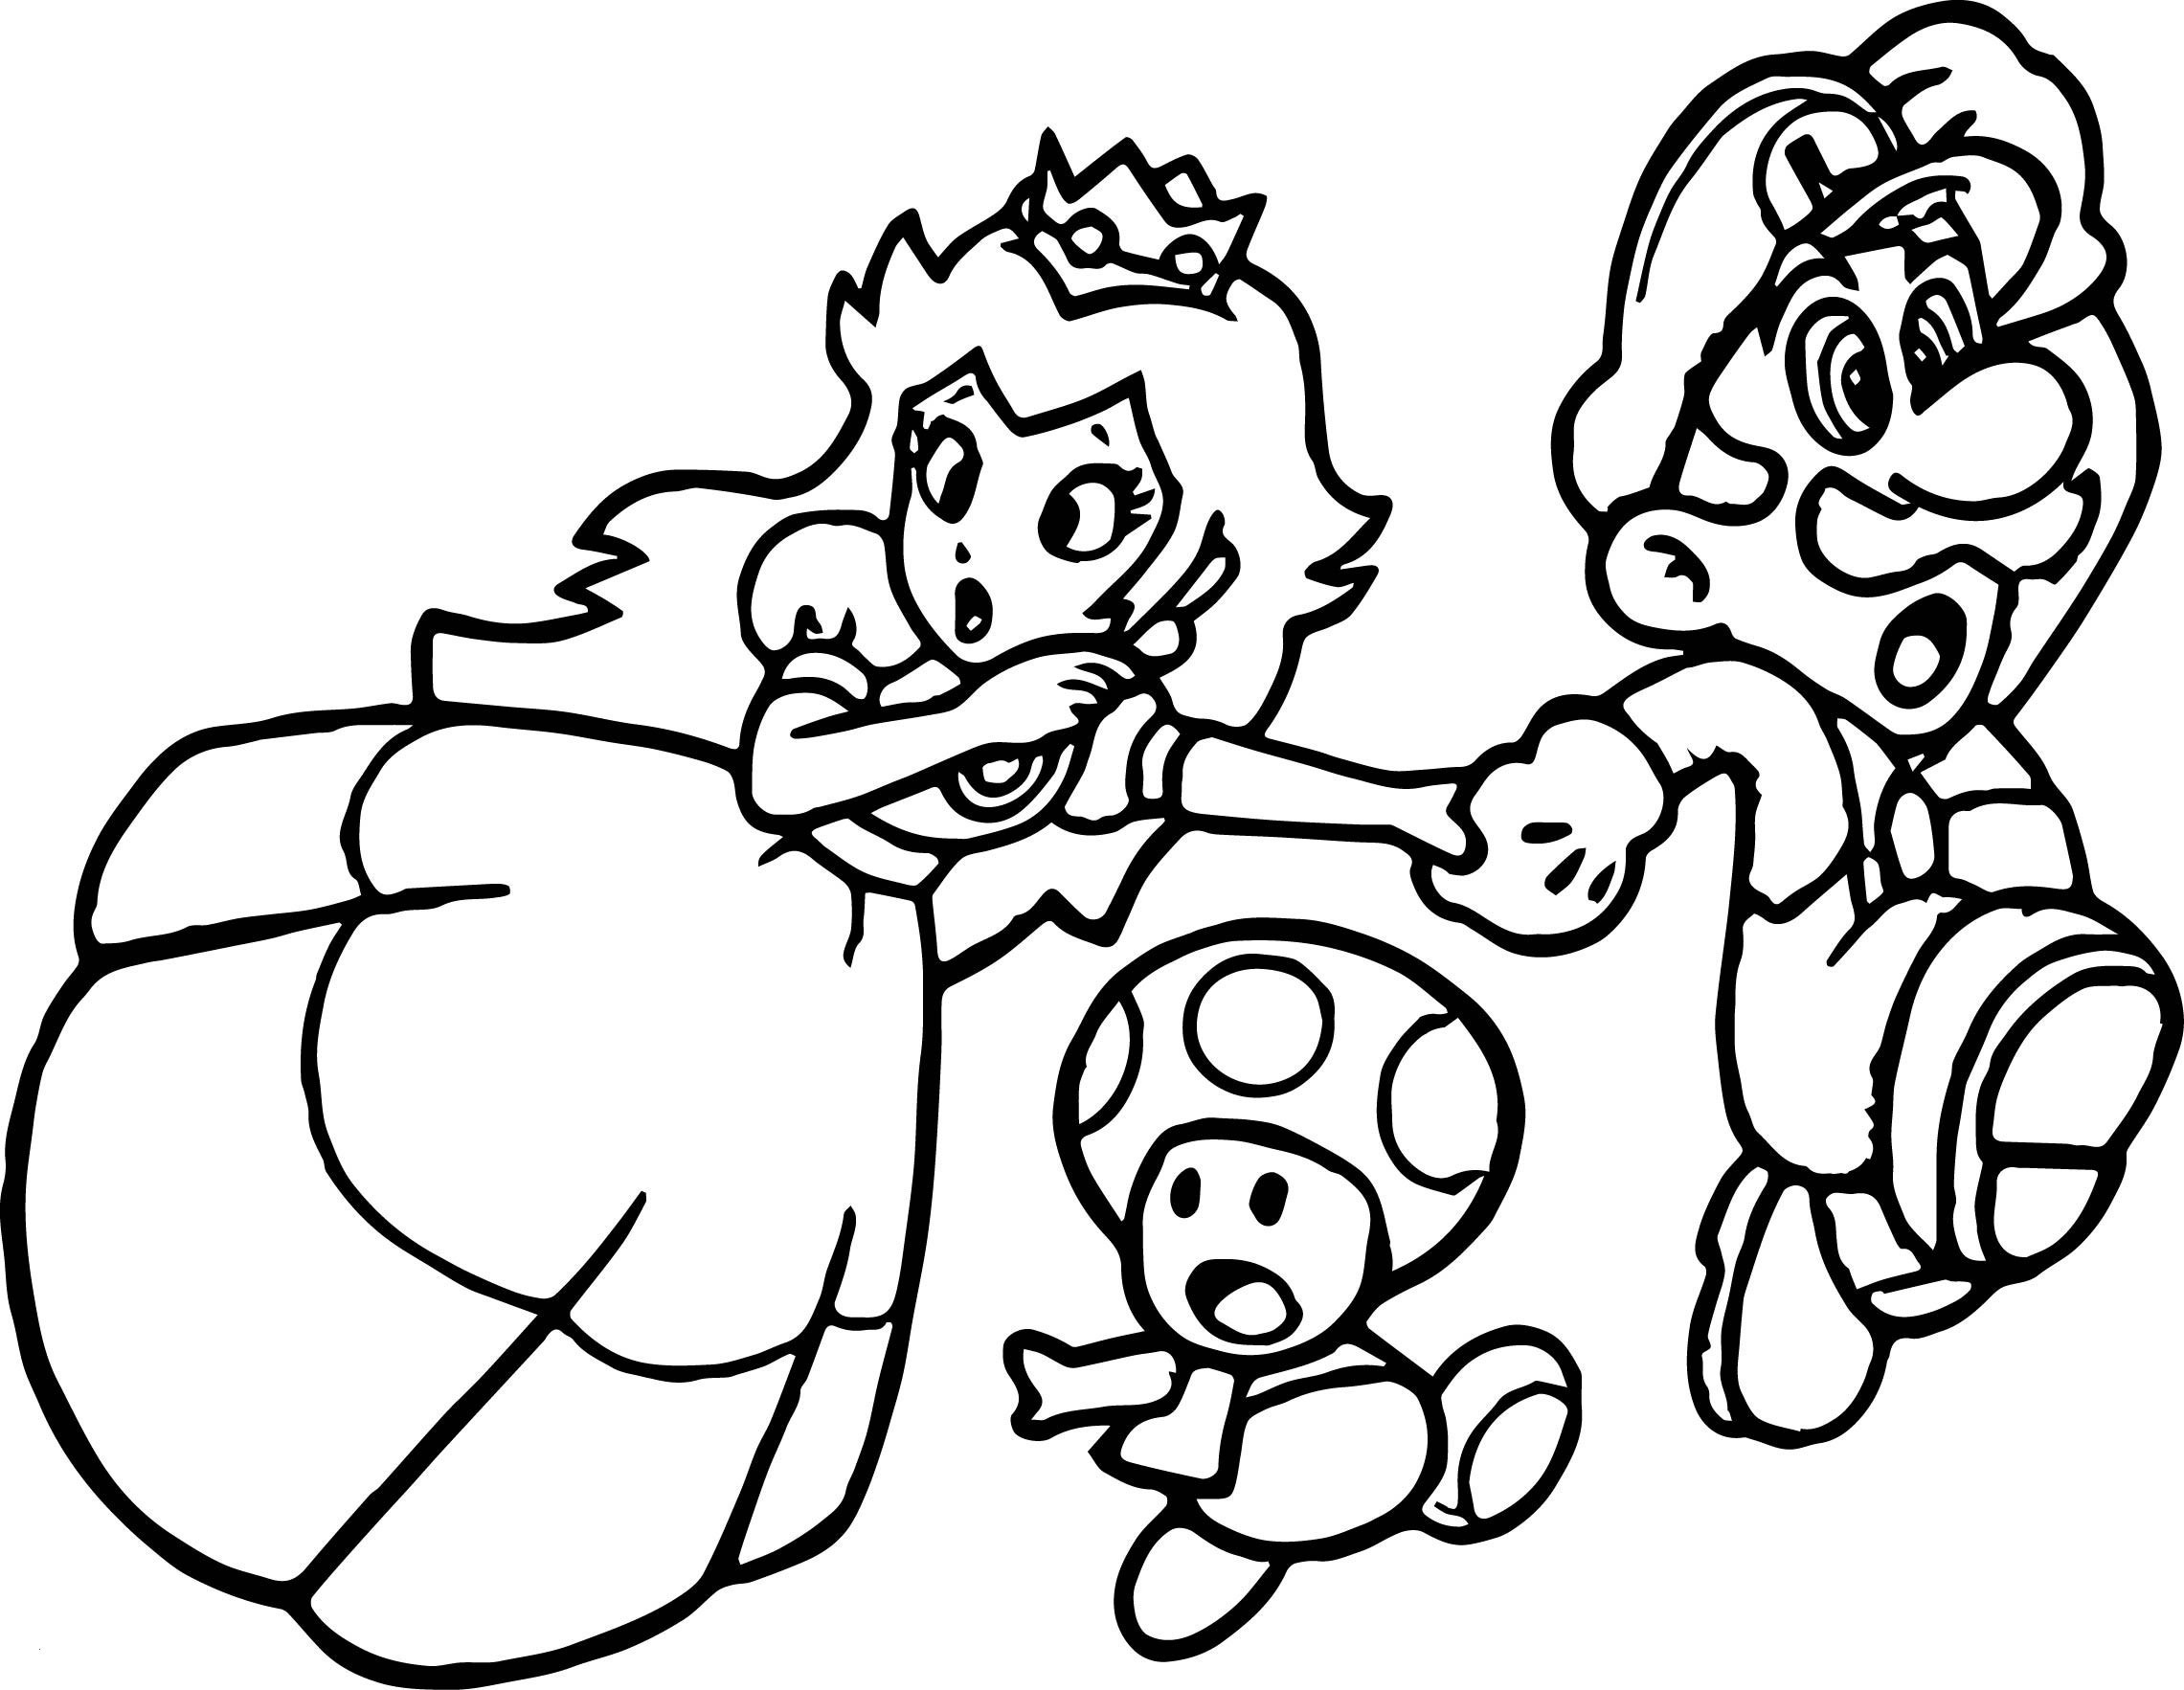 Ausmalbilder Mario Kart Neu Mario Bros Ausmalbilder Inspirierend Dibujos Para Colorear De sonic Das Bild